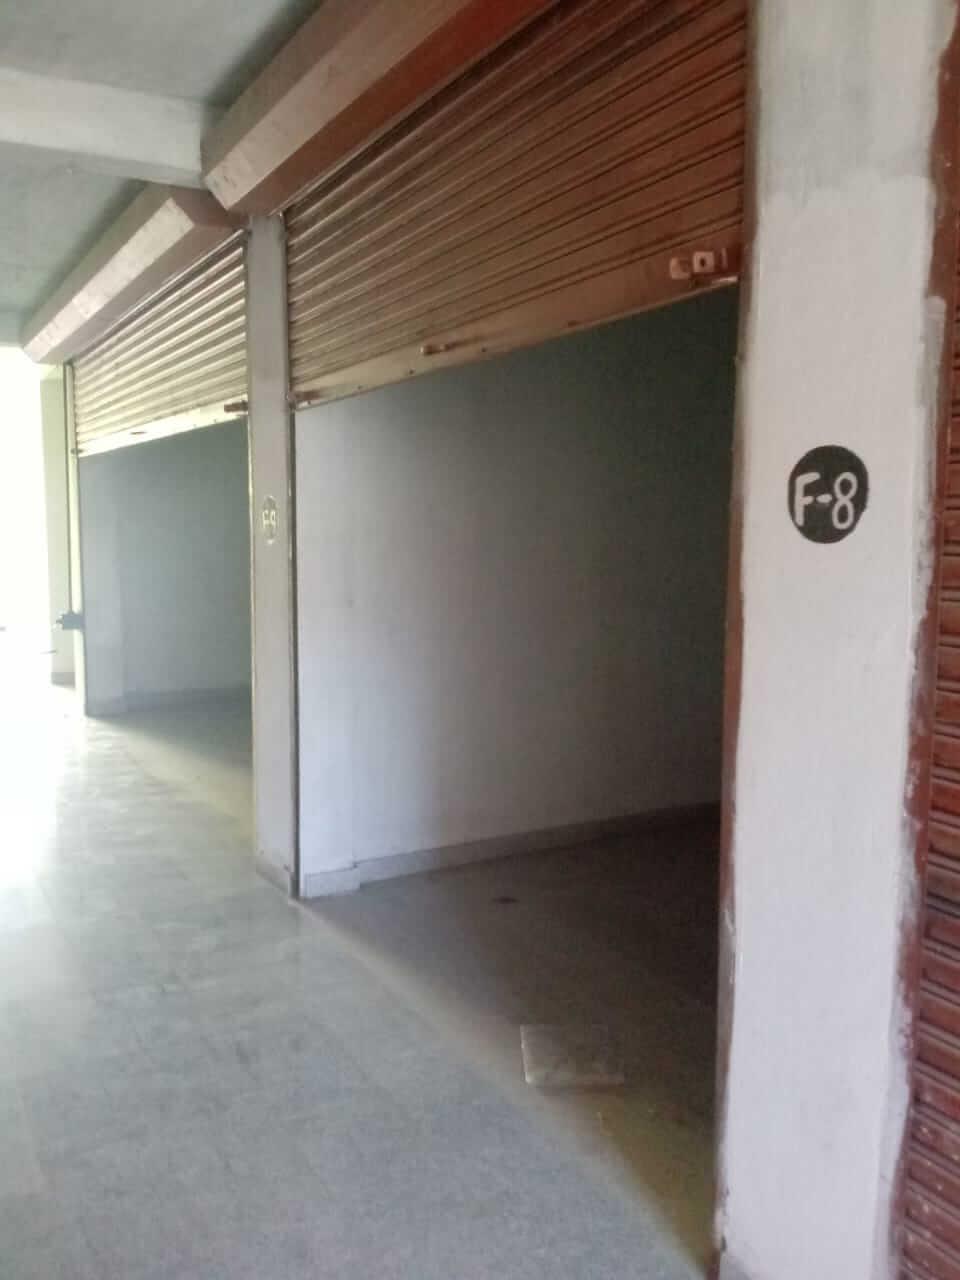 Office Space for Rent 100 Sq. Feet at Coimbatore, Ram Nagar